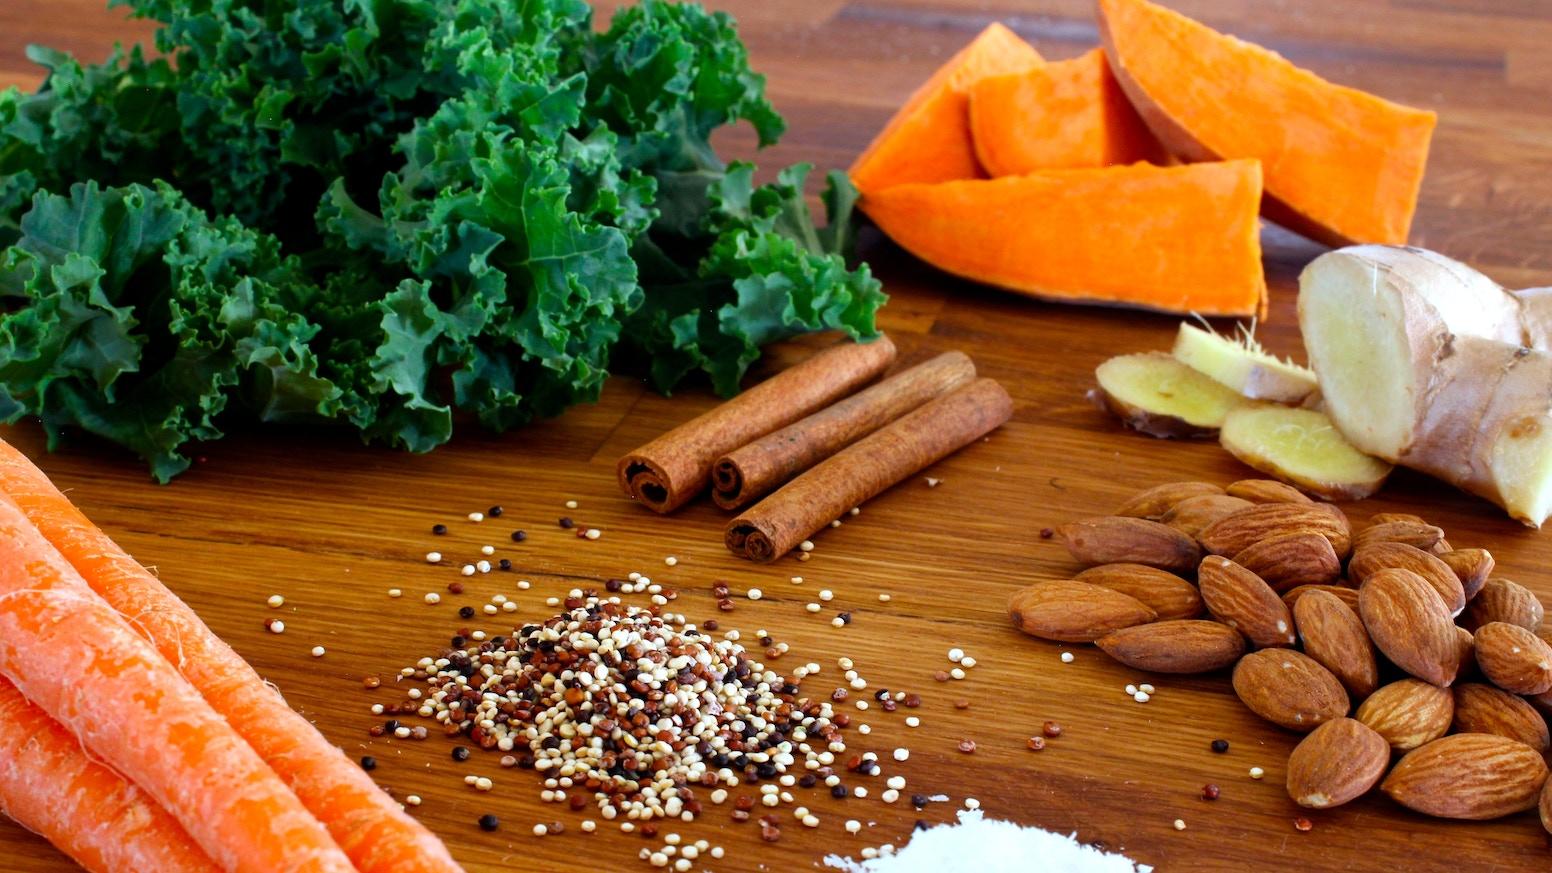 Thesaladbar vegetable based nutrition bar by eleanor for Food s bar unloc